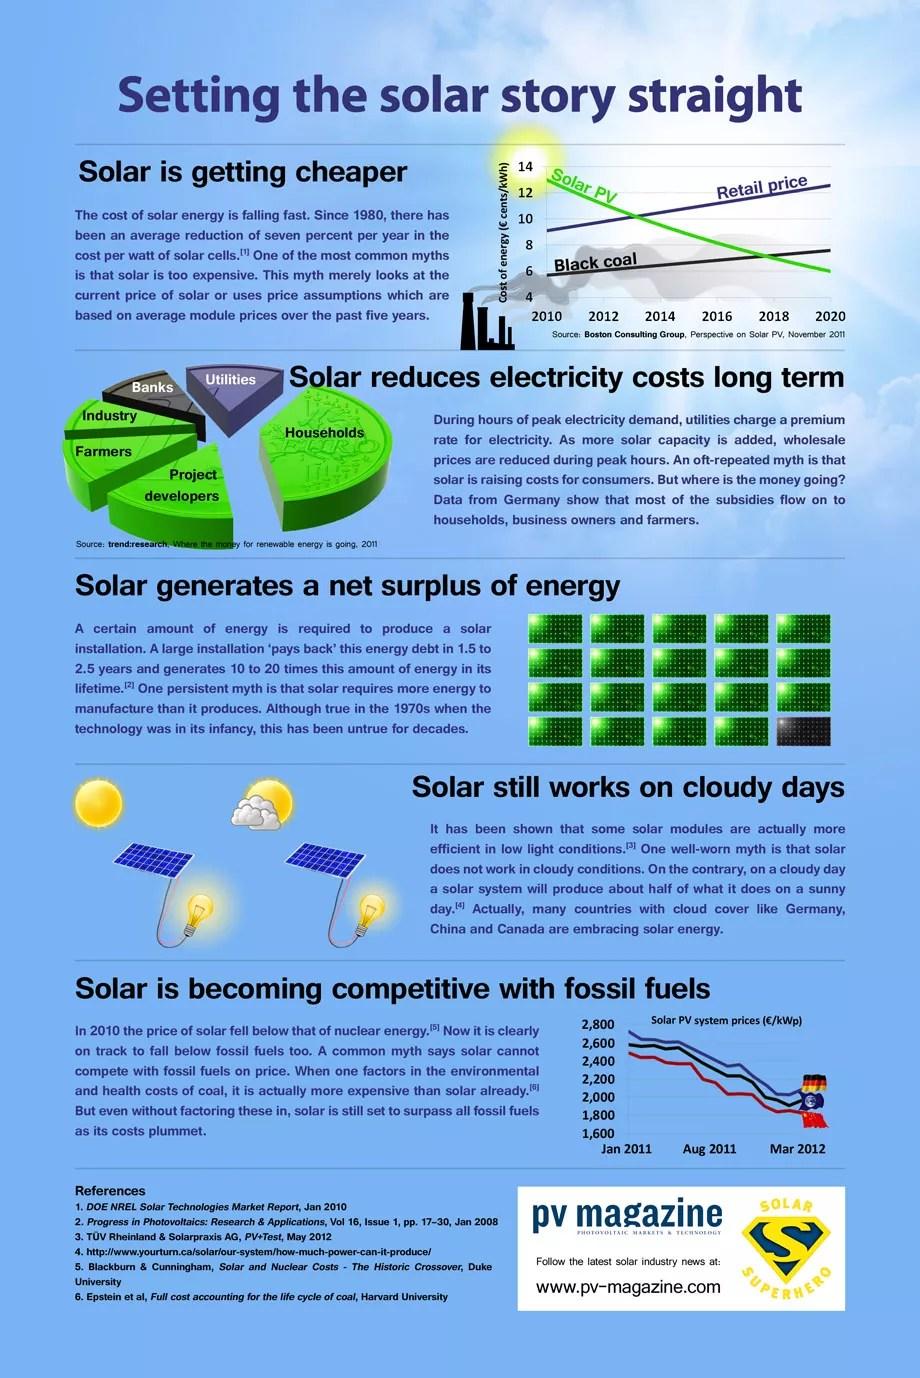 solar energy myths debunked